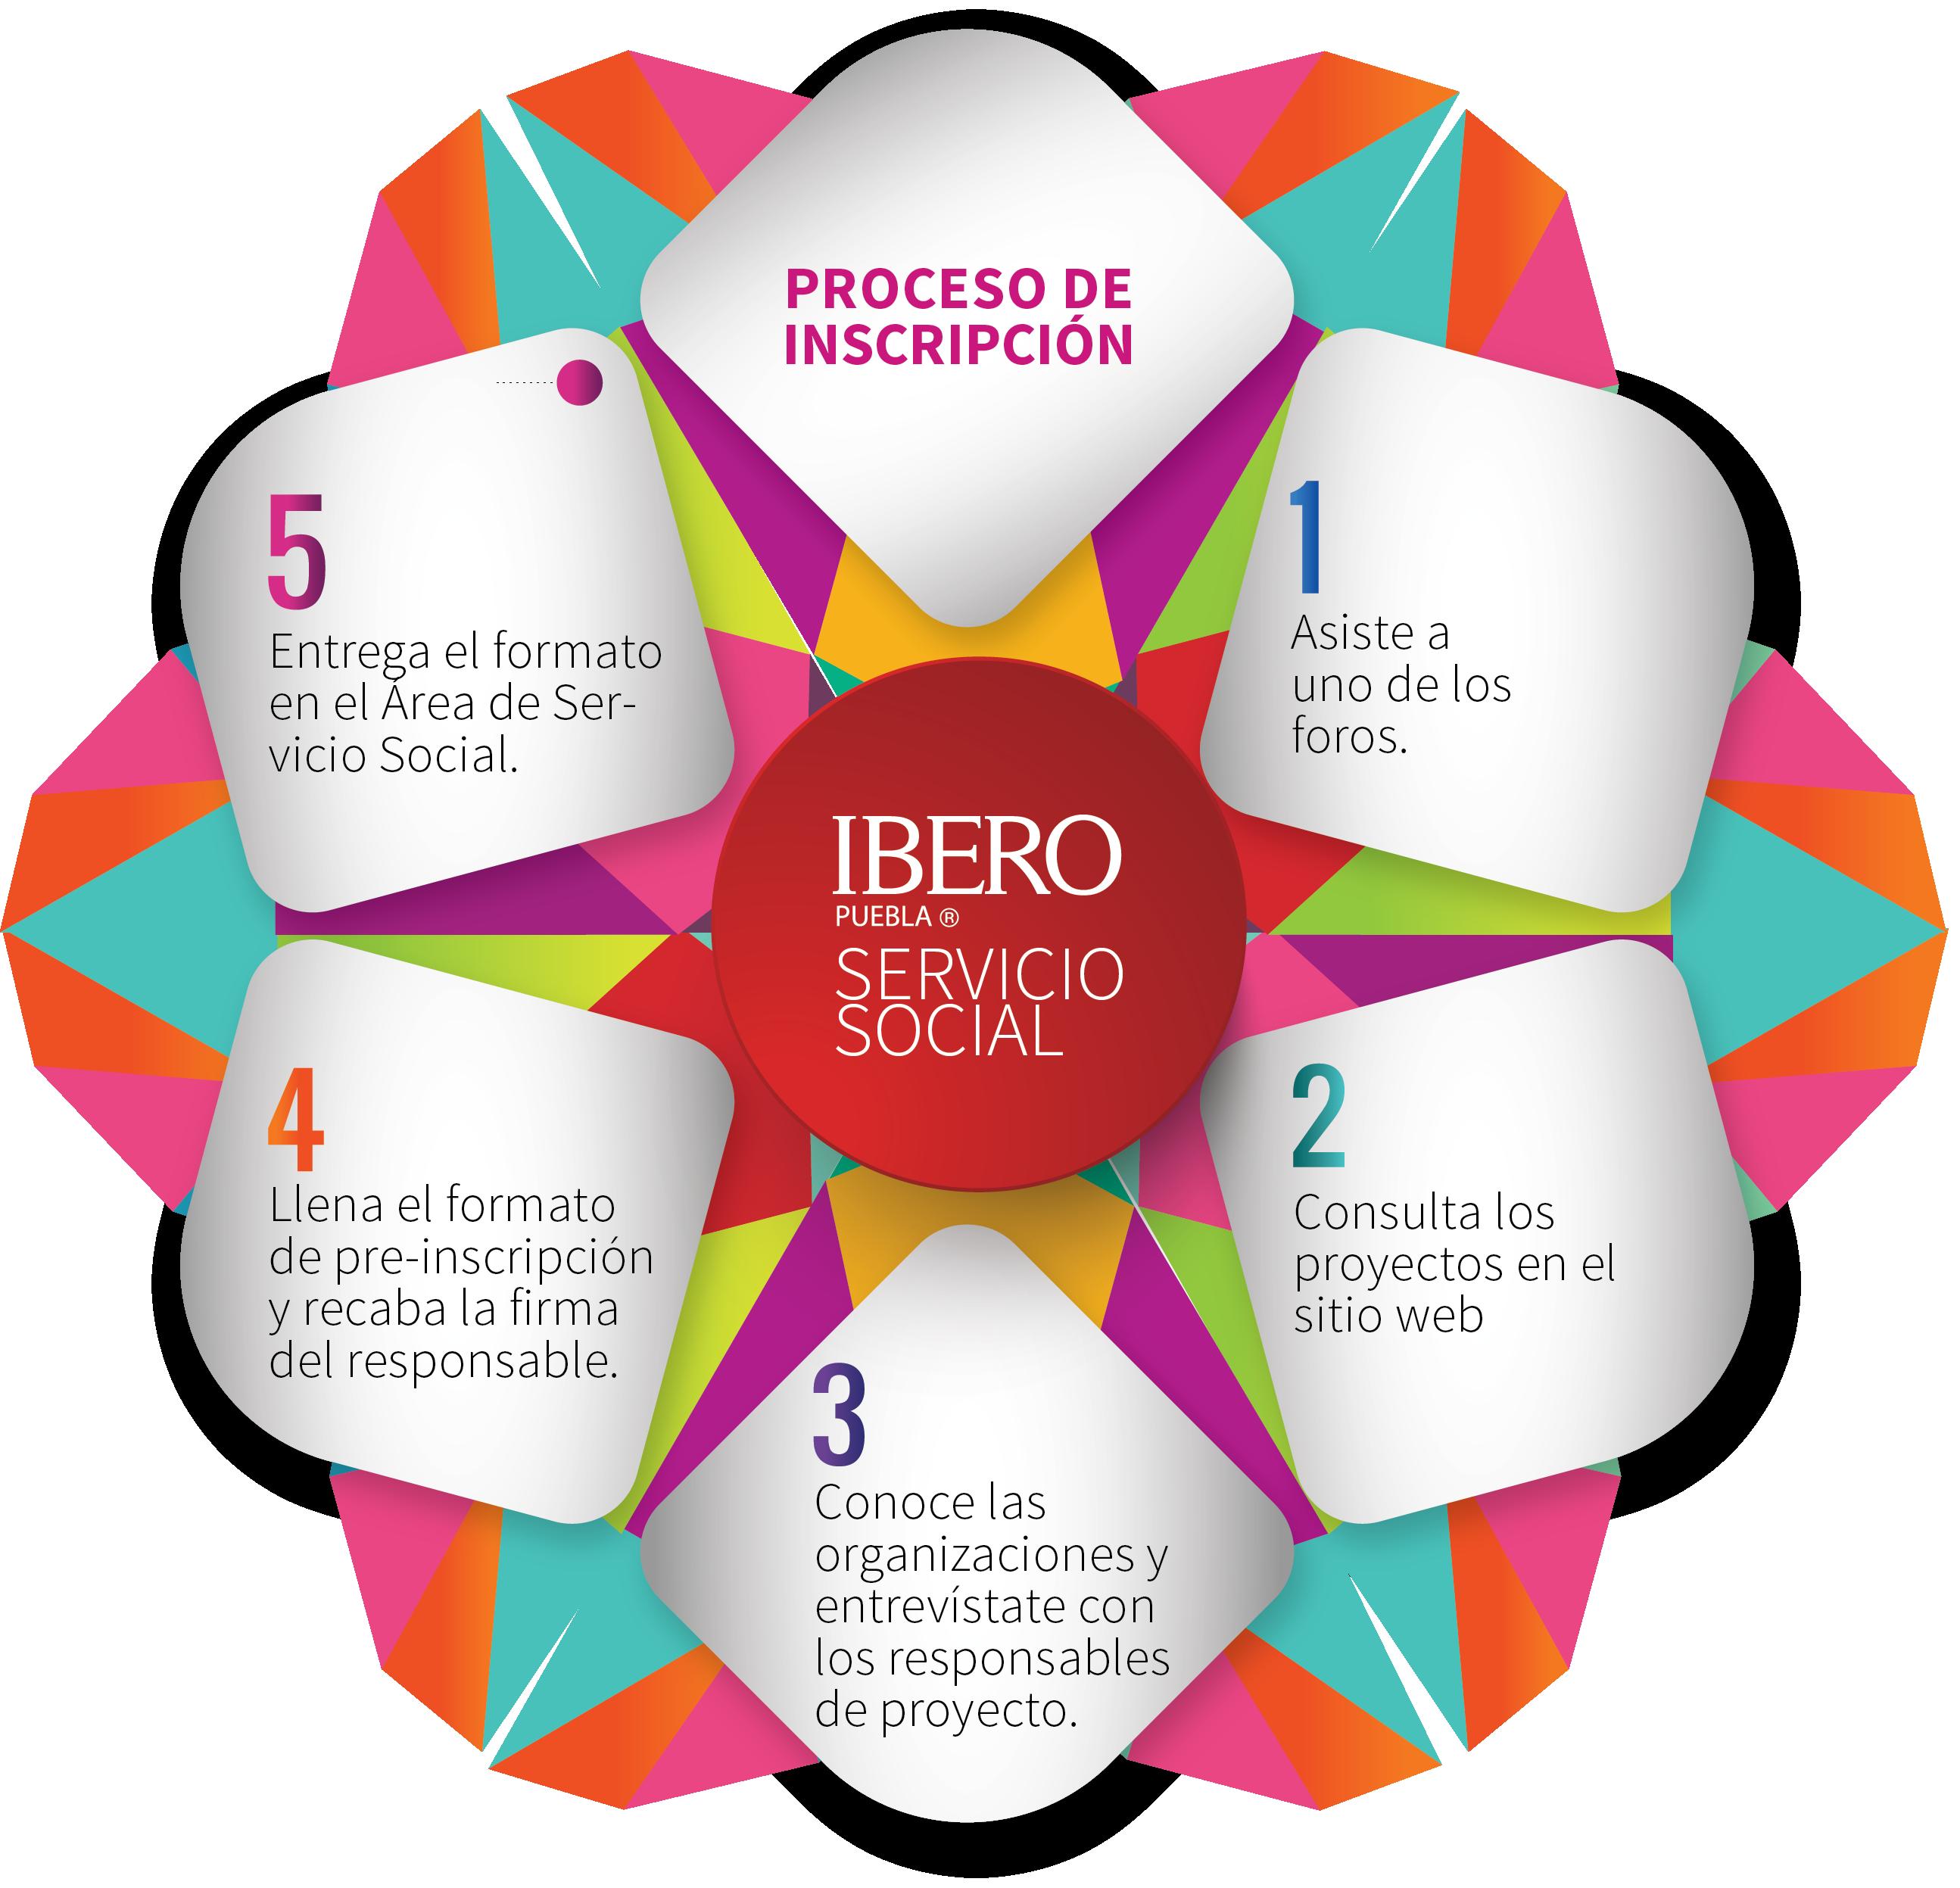 https://repo.iberopuebla.mx/img/procesoServicioSocial.png